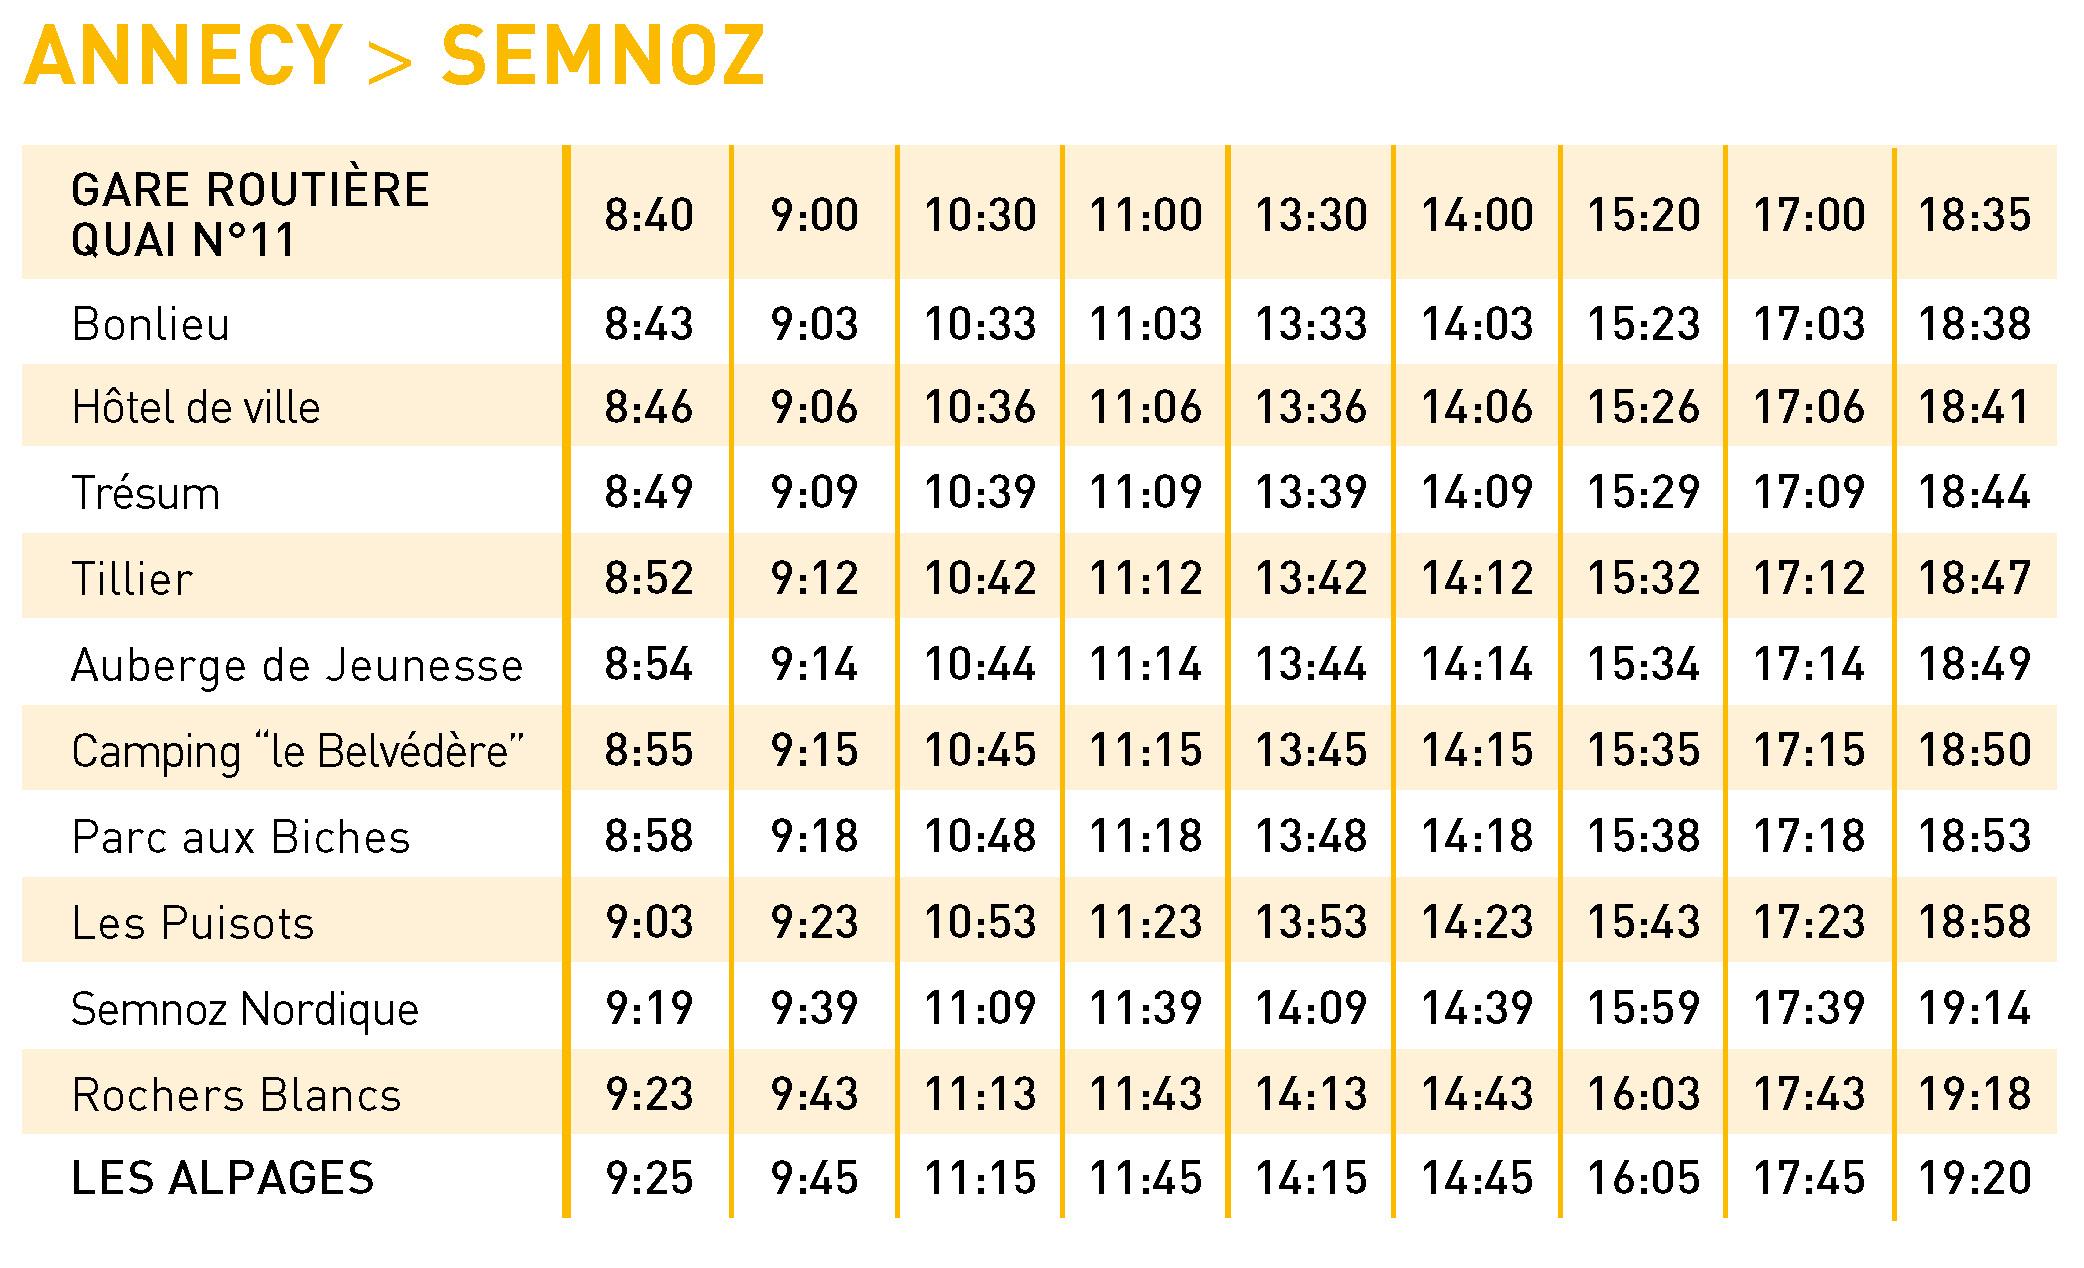 Grille horaire S4 Aller - 2021